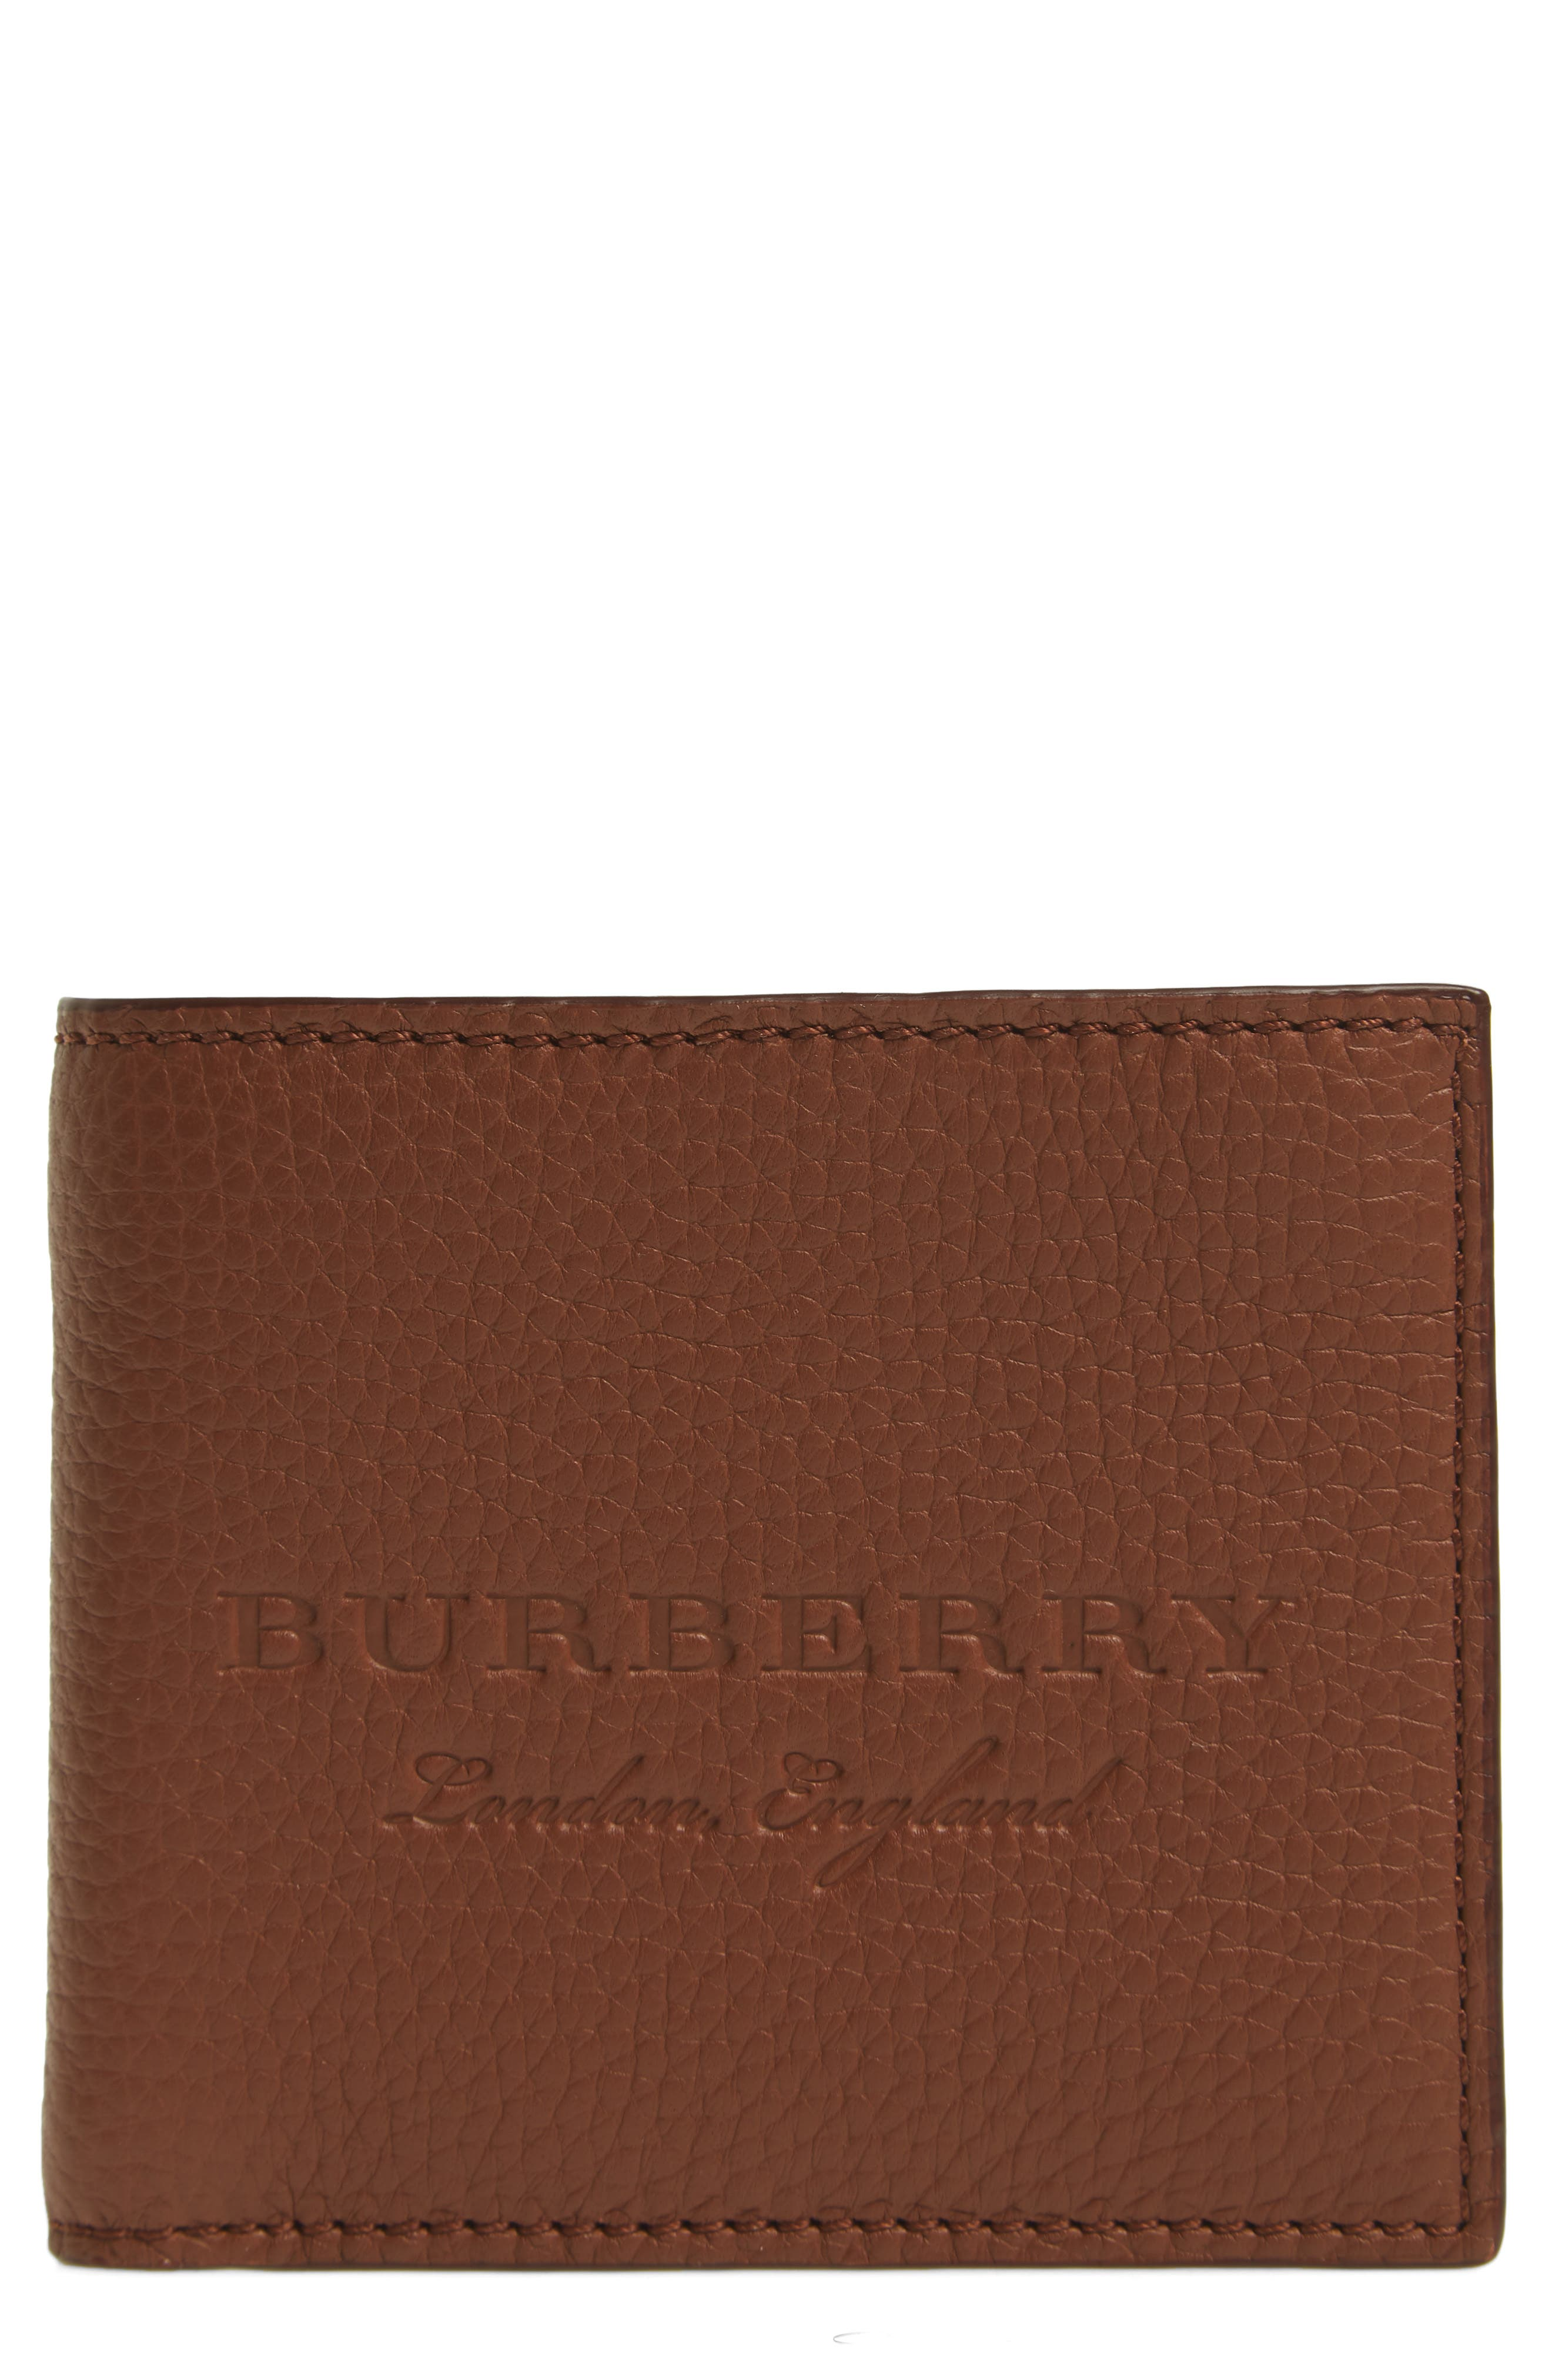 Alternate Image 1 Selected - Burberry Billfold Wallet